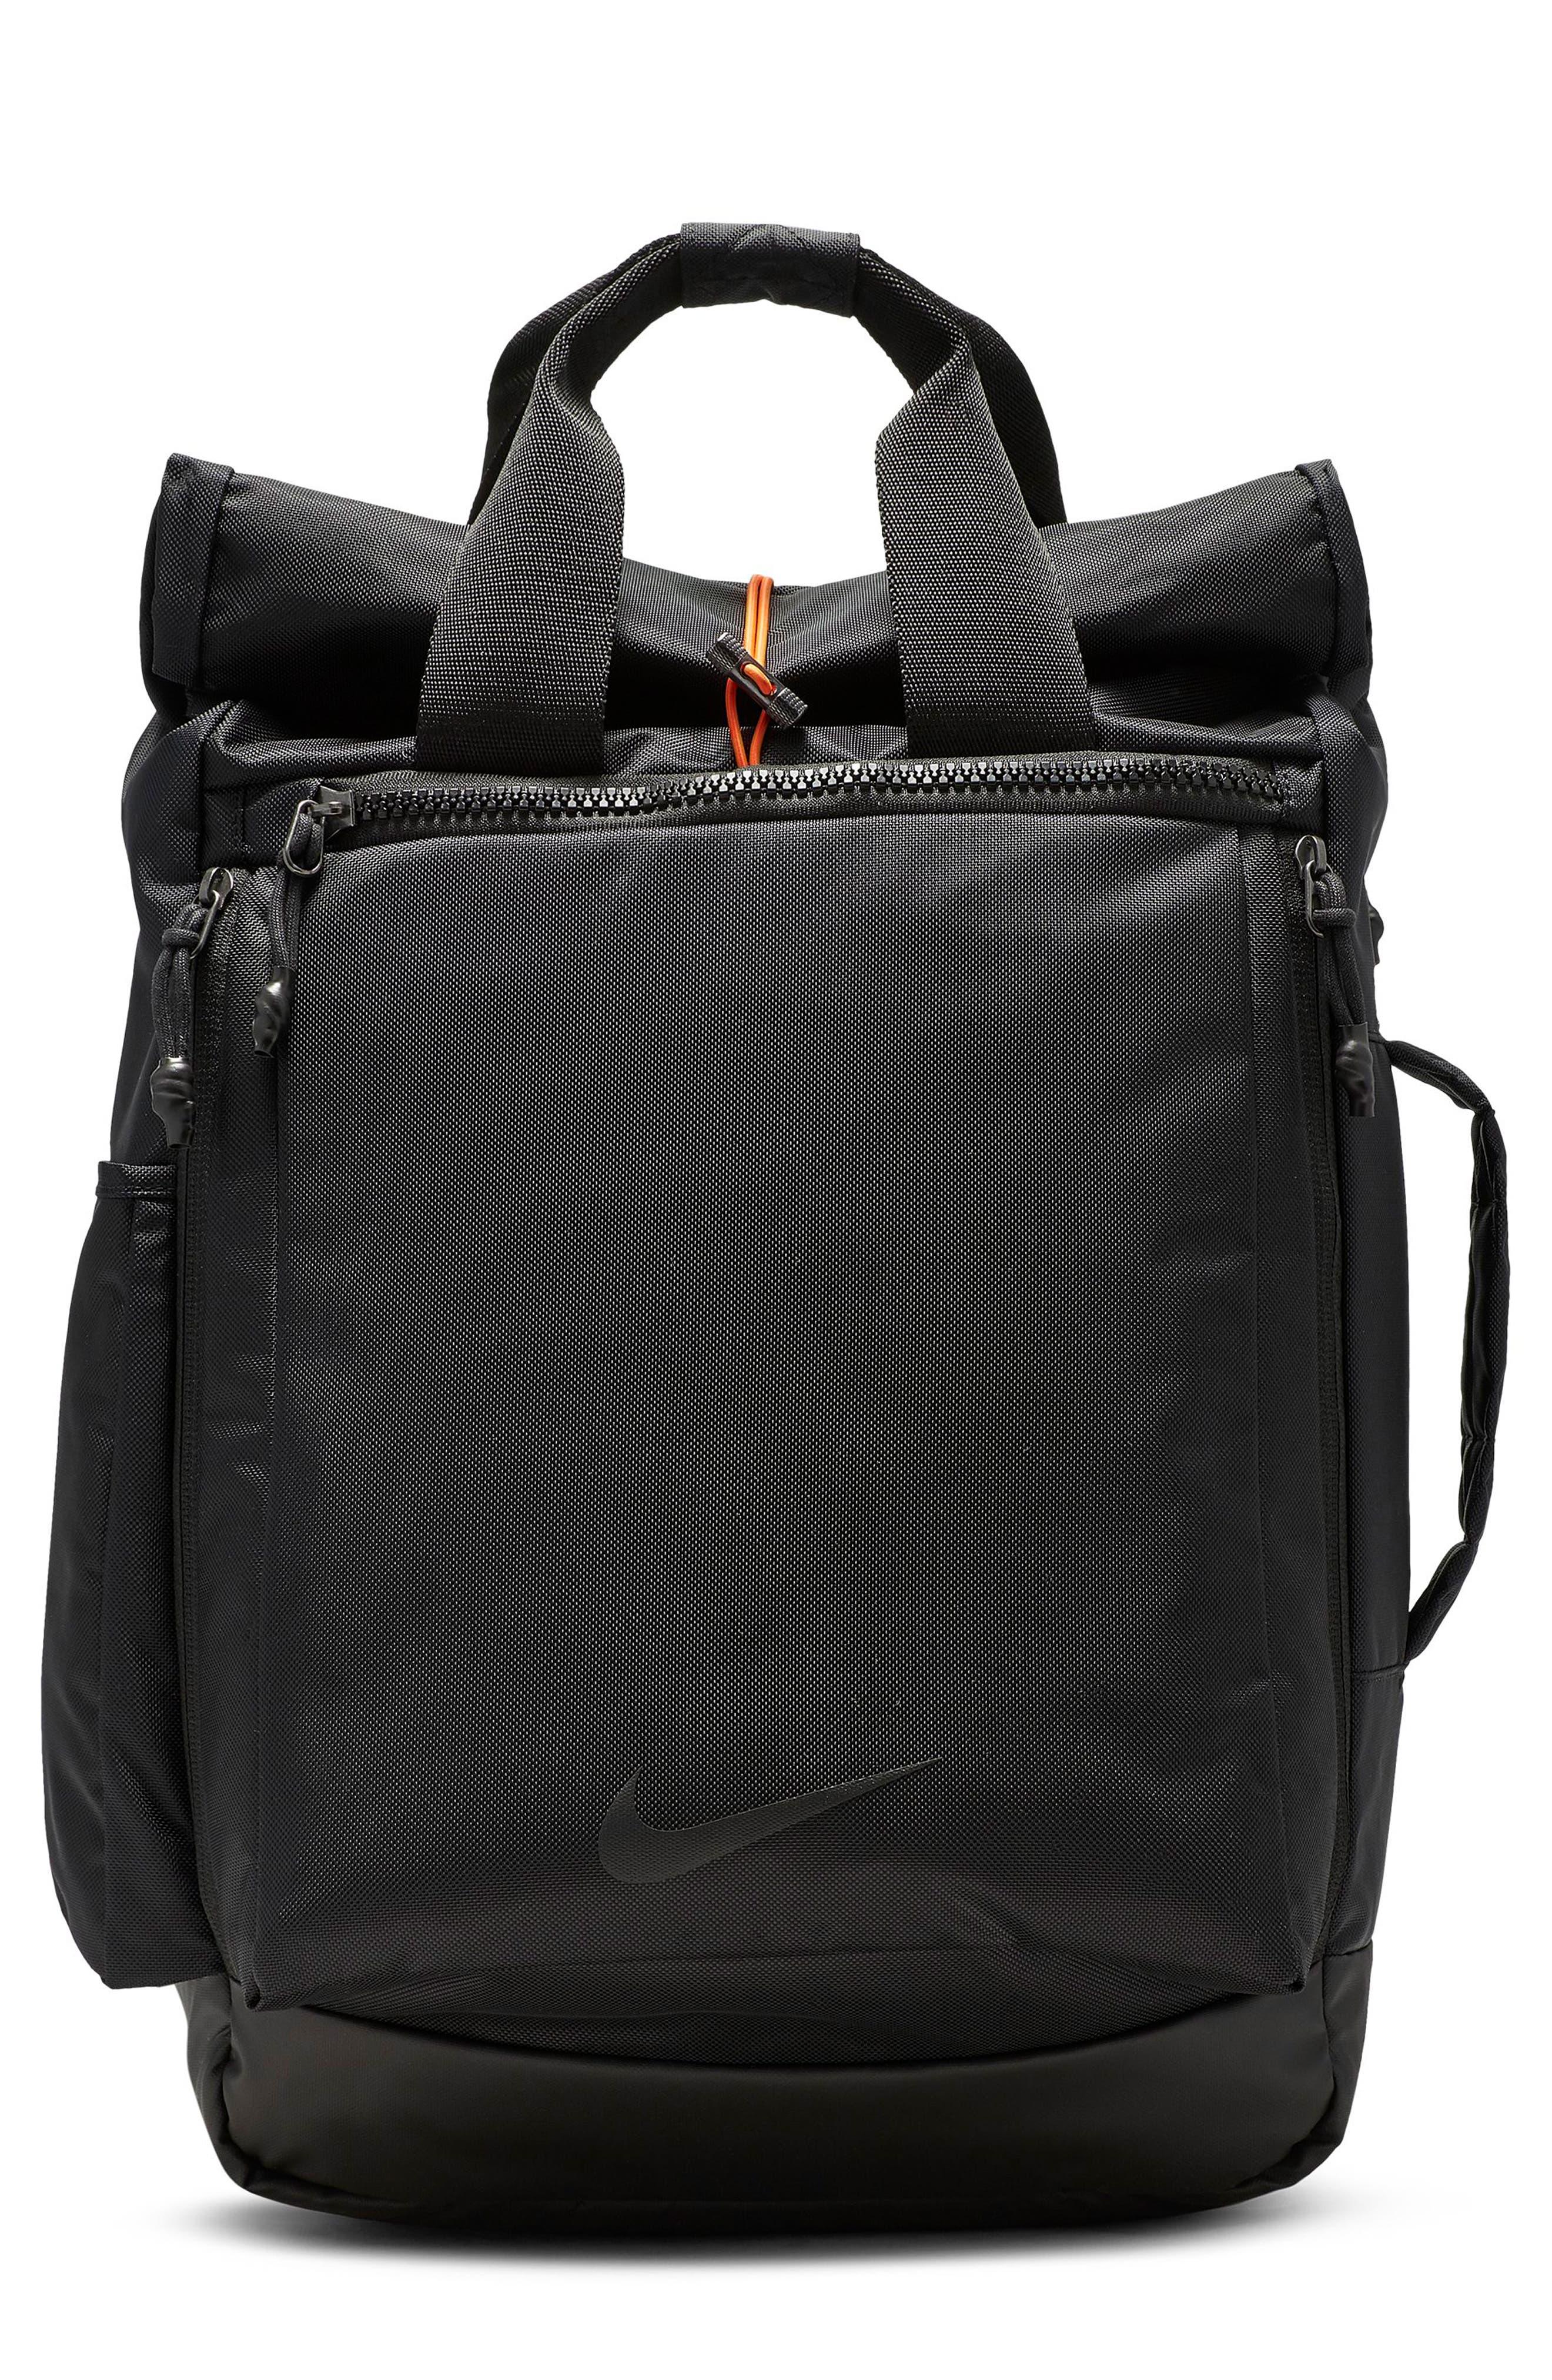 NIKE Vapor Energy 2.0 Training Backpack, Main, color, BLACK